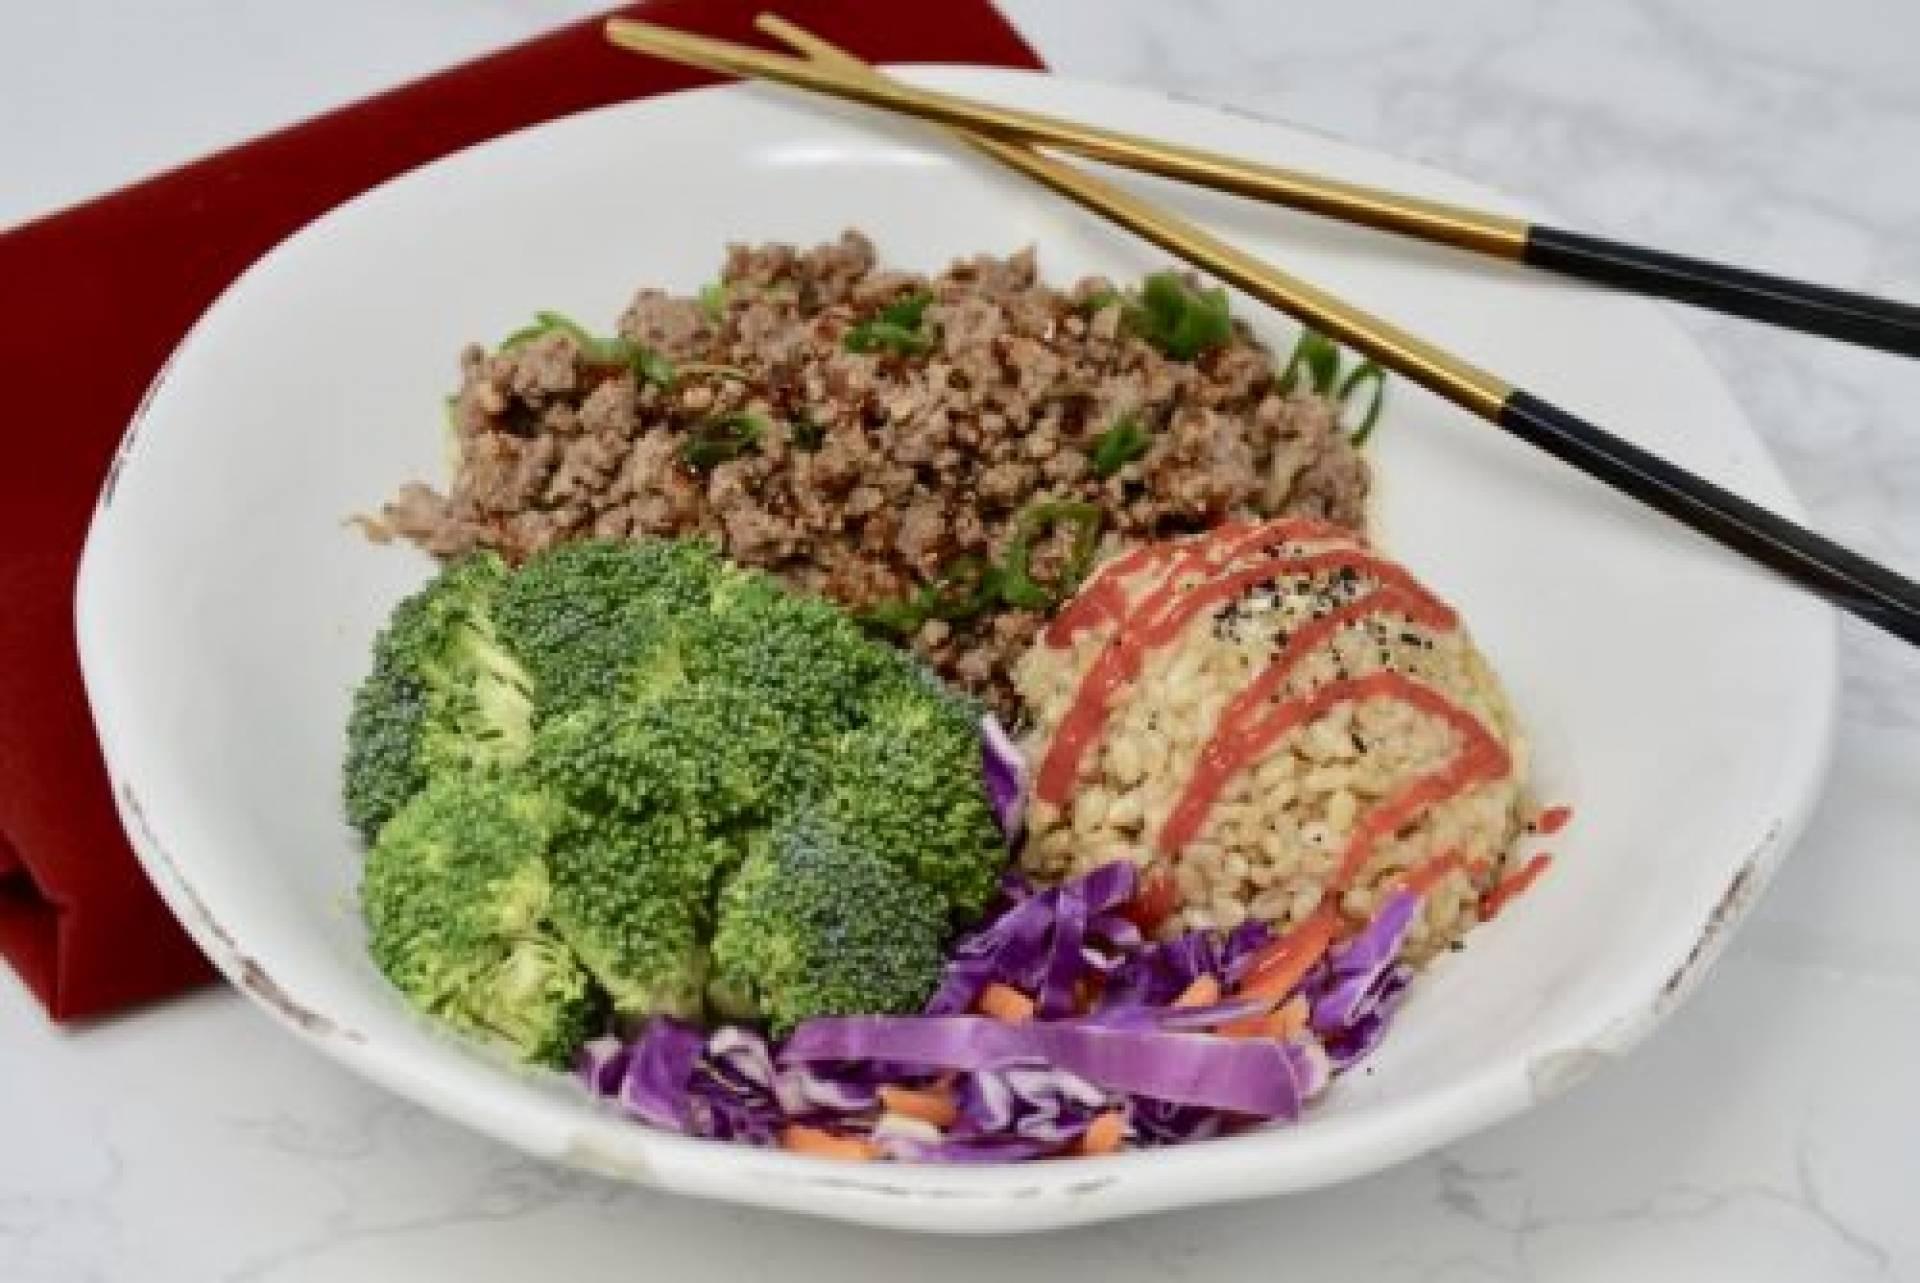 KETO Korean Grass-Fed Beef and Cauliflower Rice